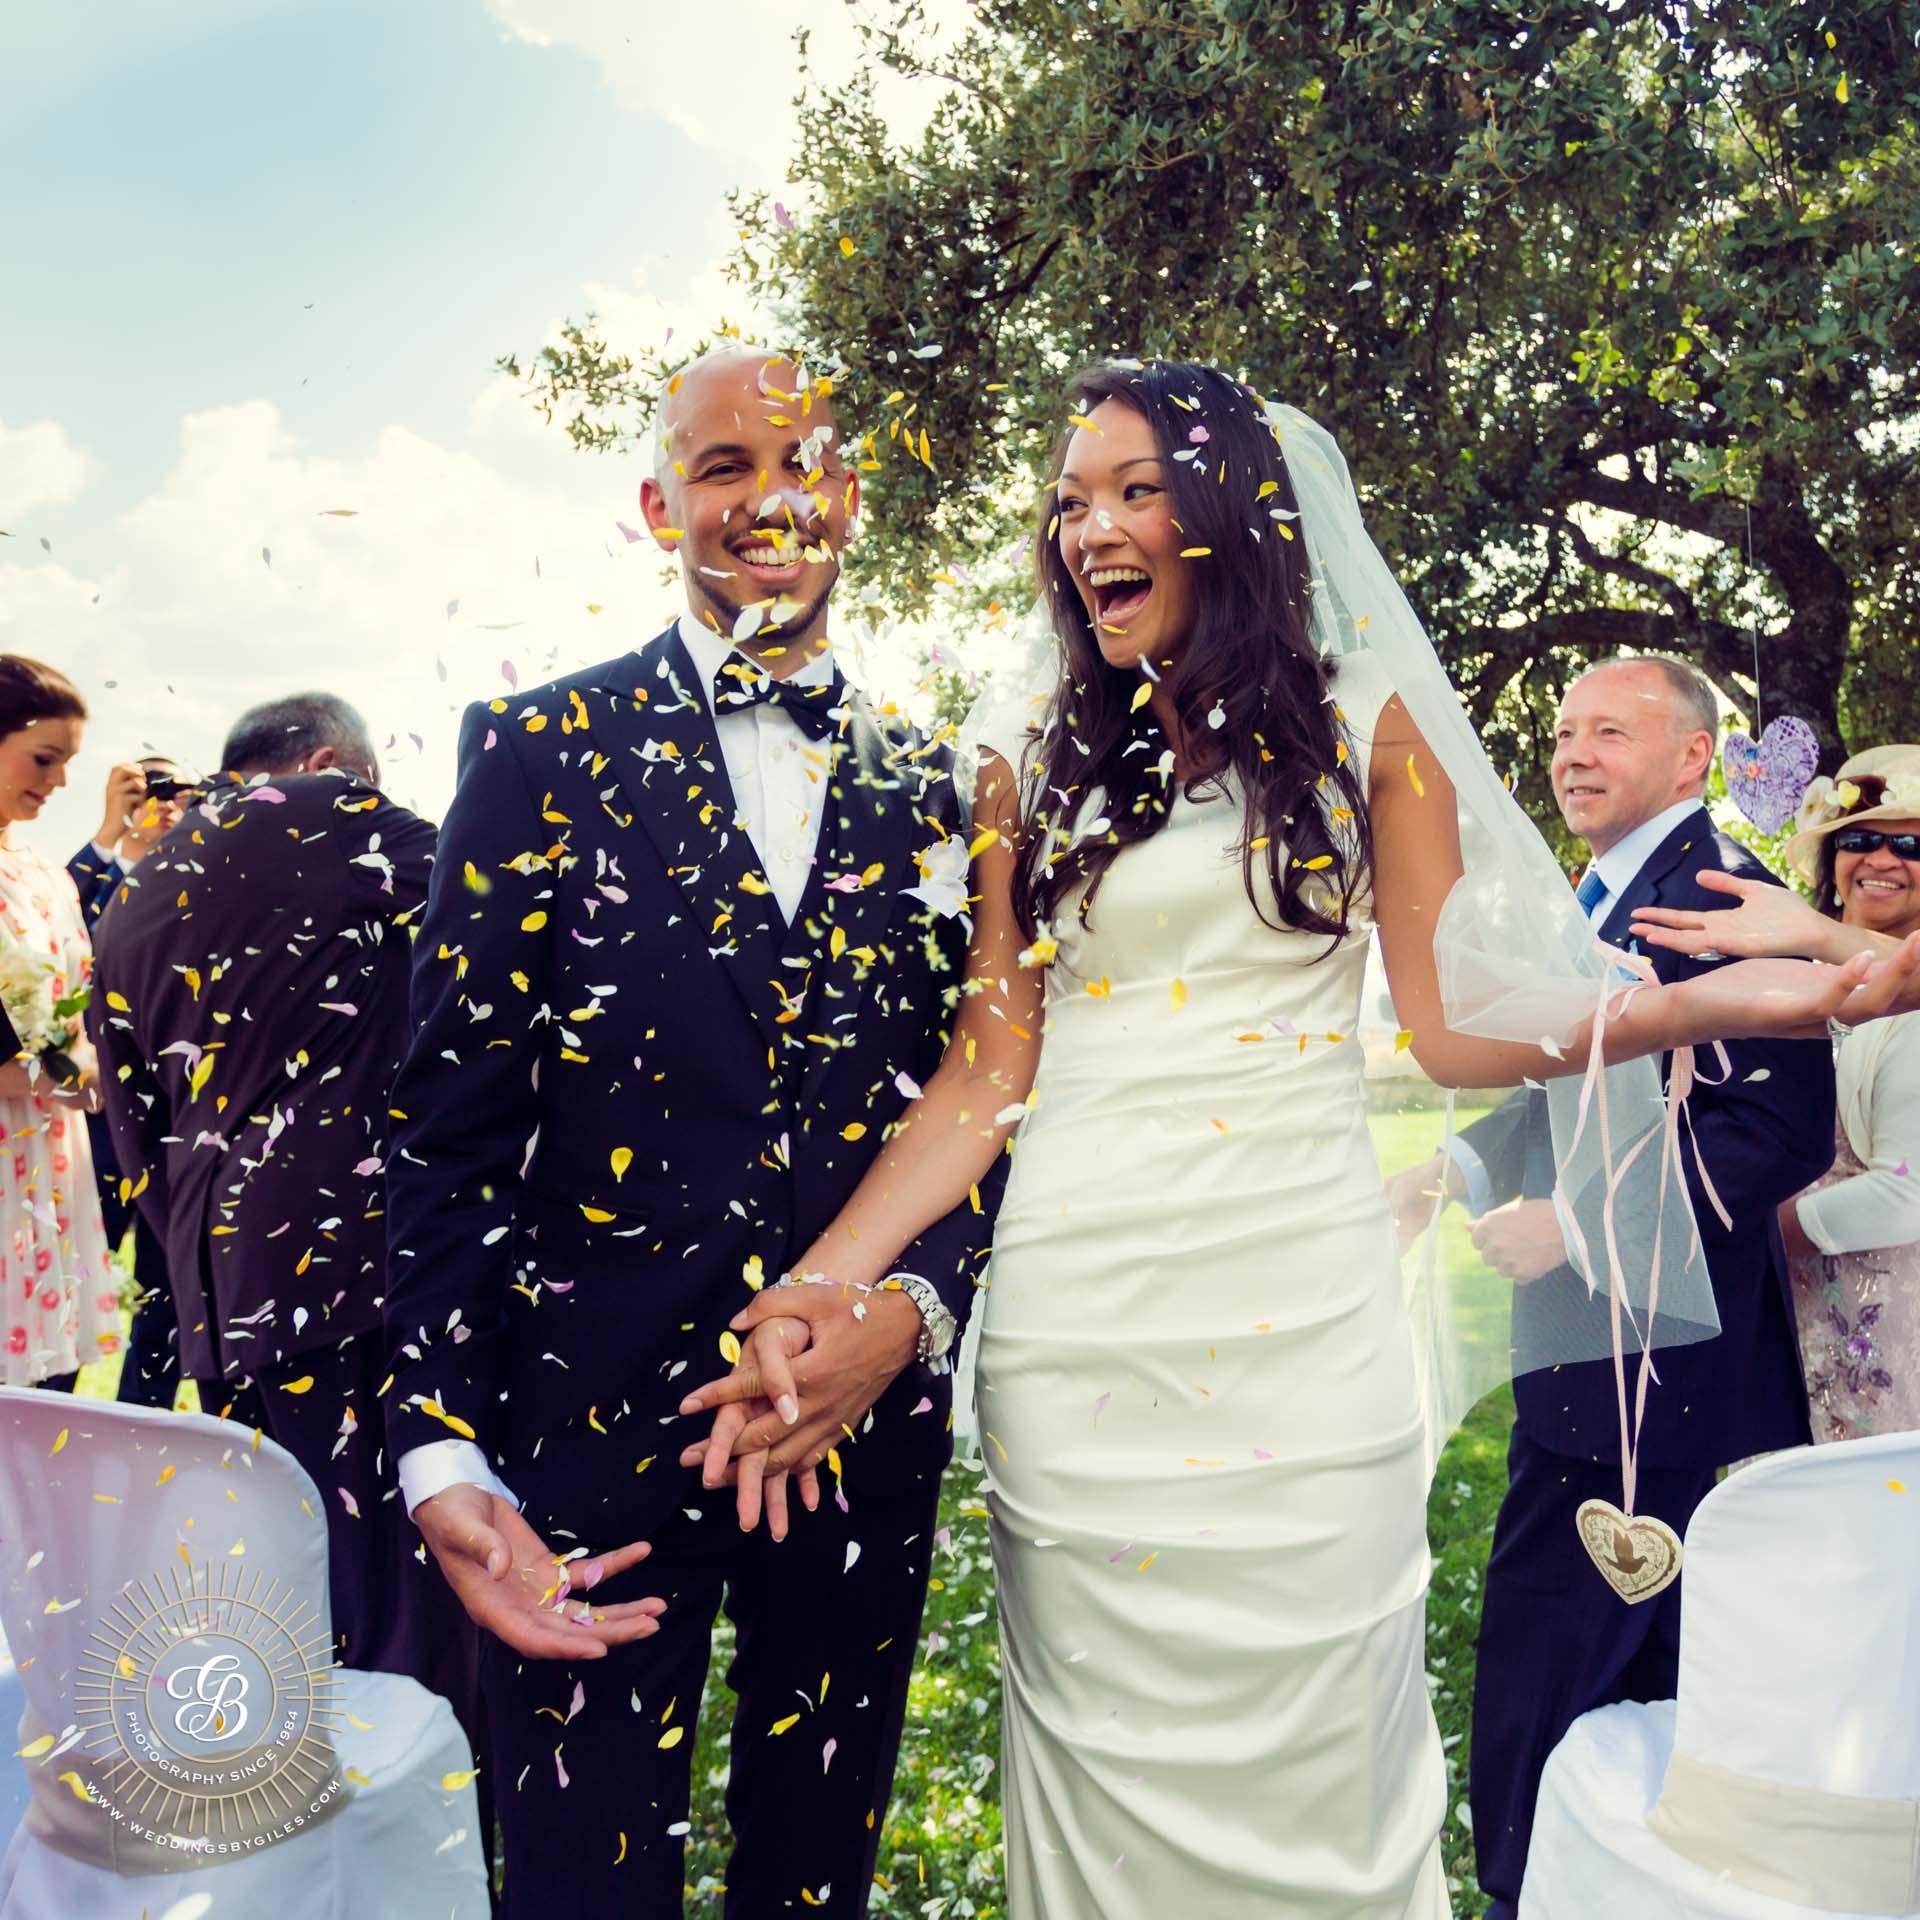 garden wedding confetti down the isle